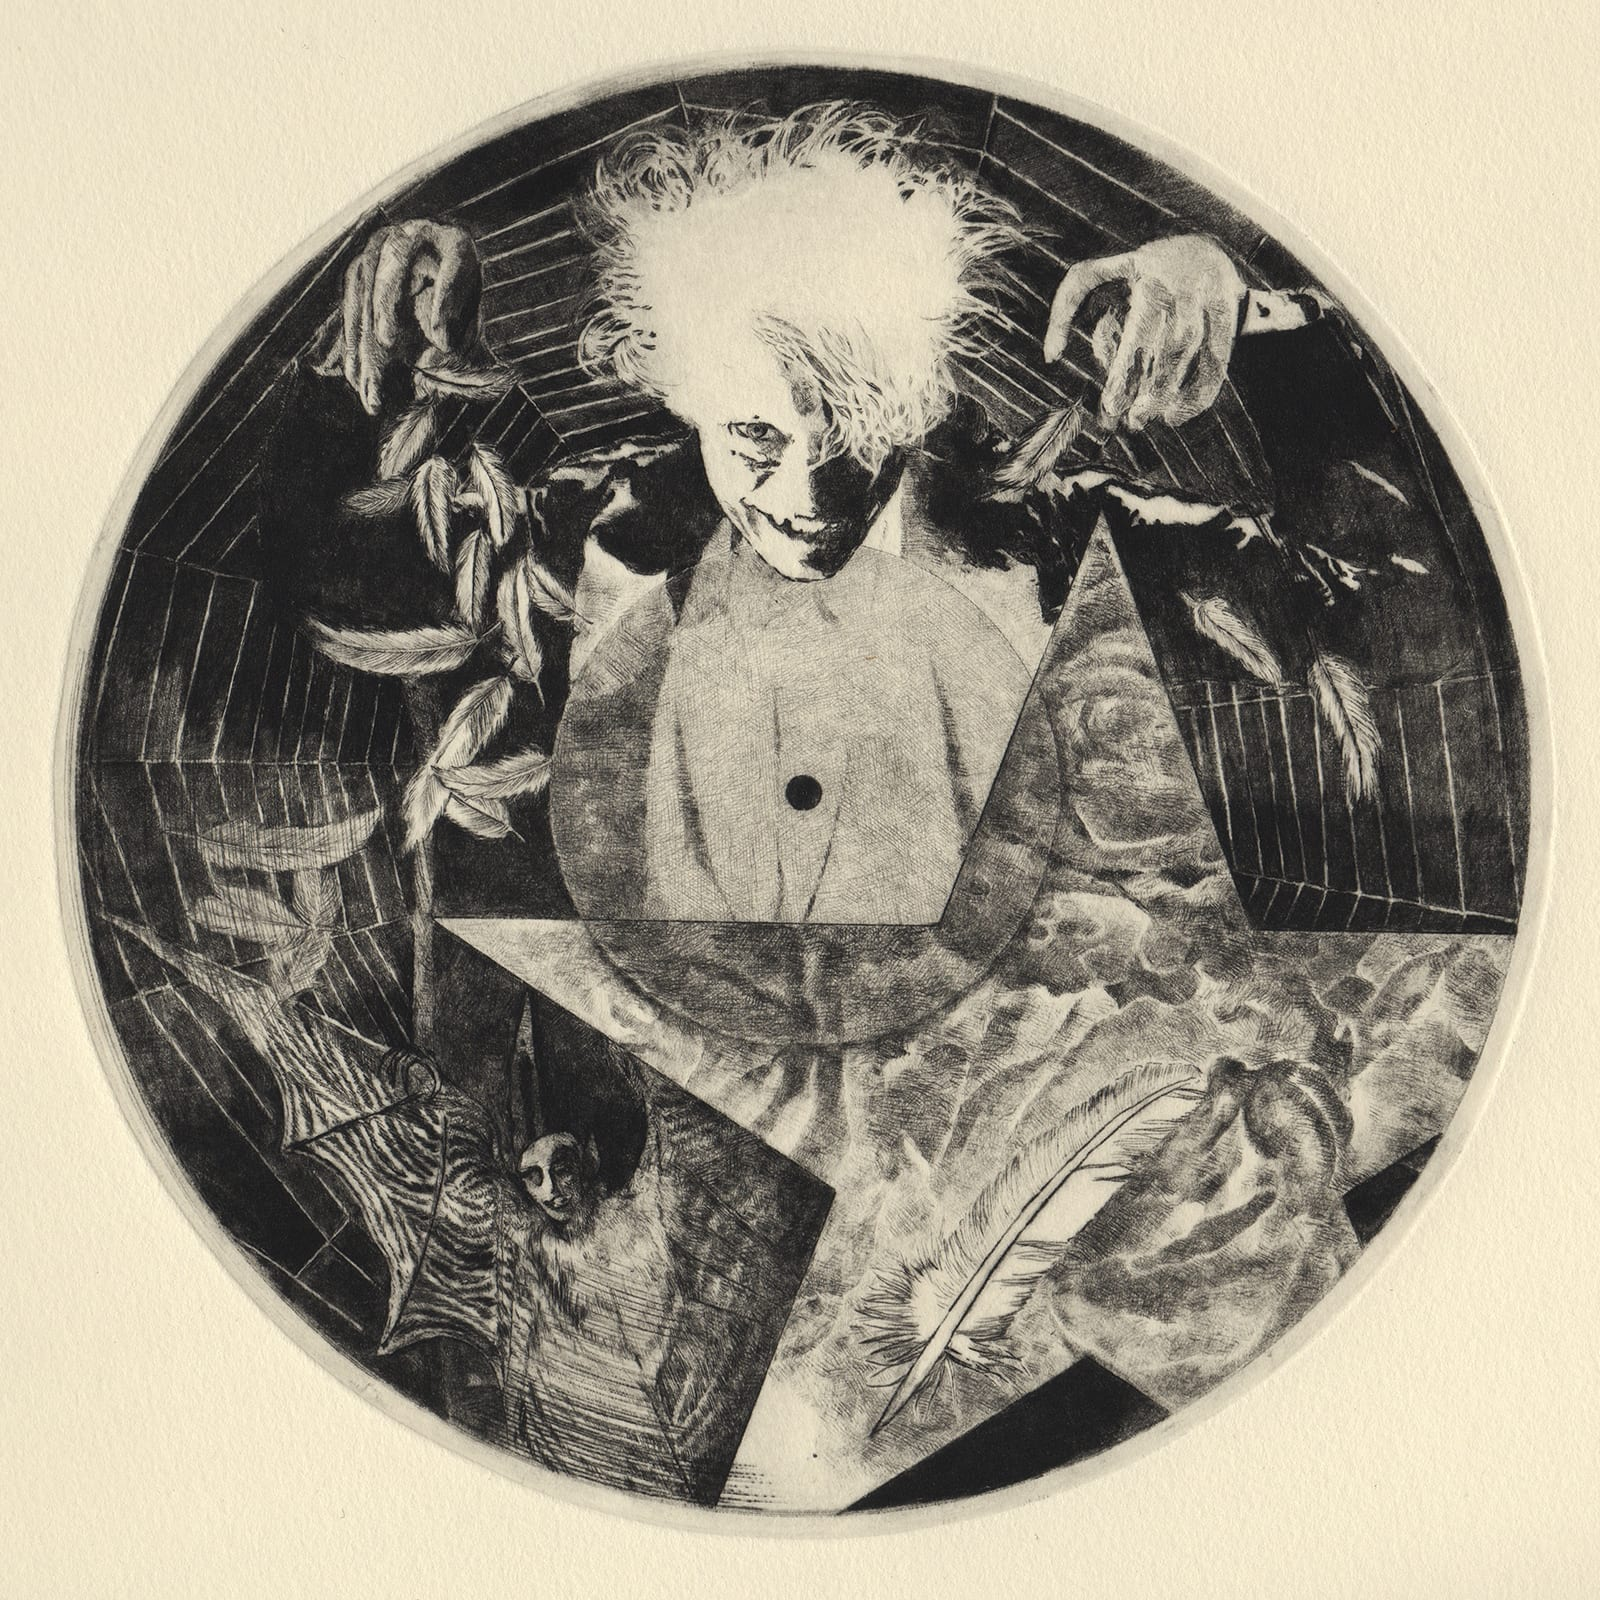 Music (drypoint etching by Yaemi Shigyo)